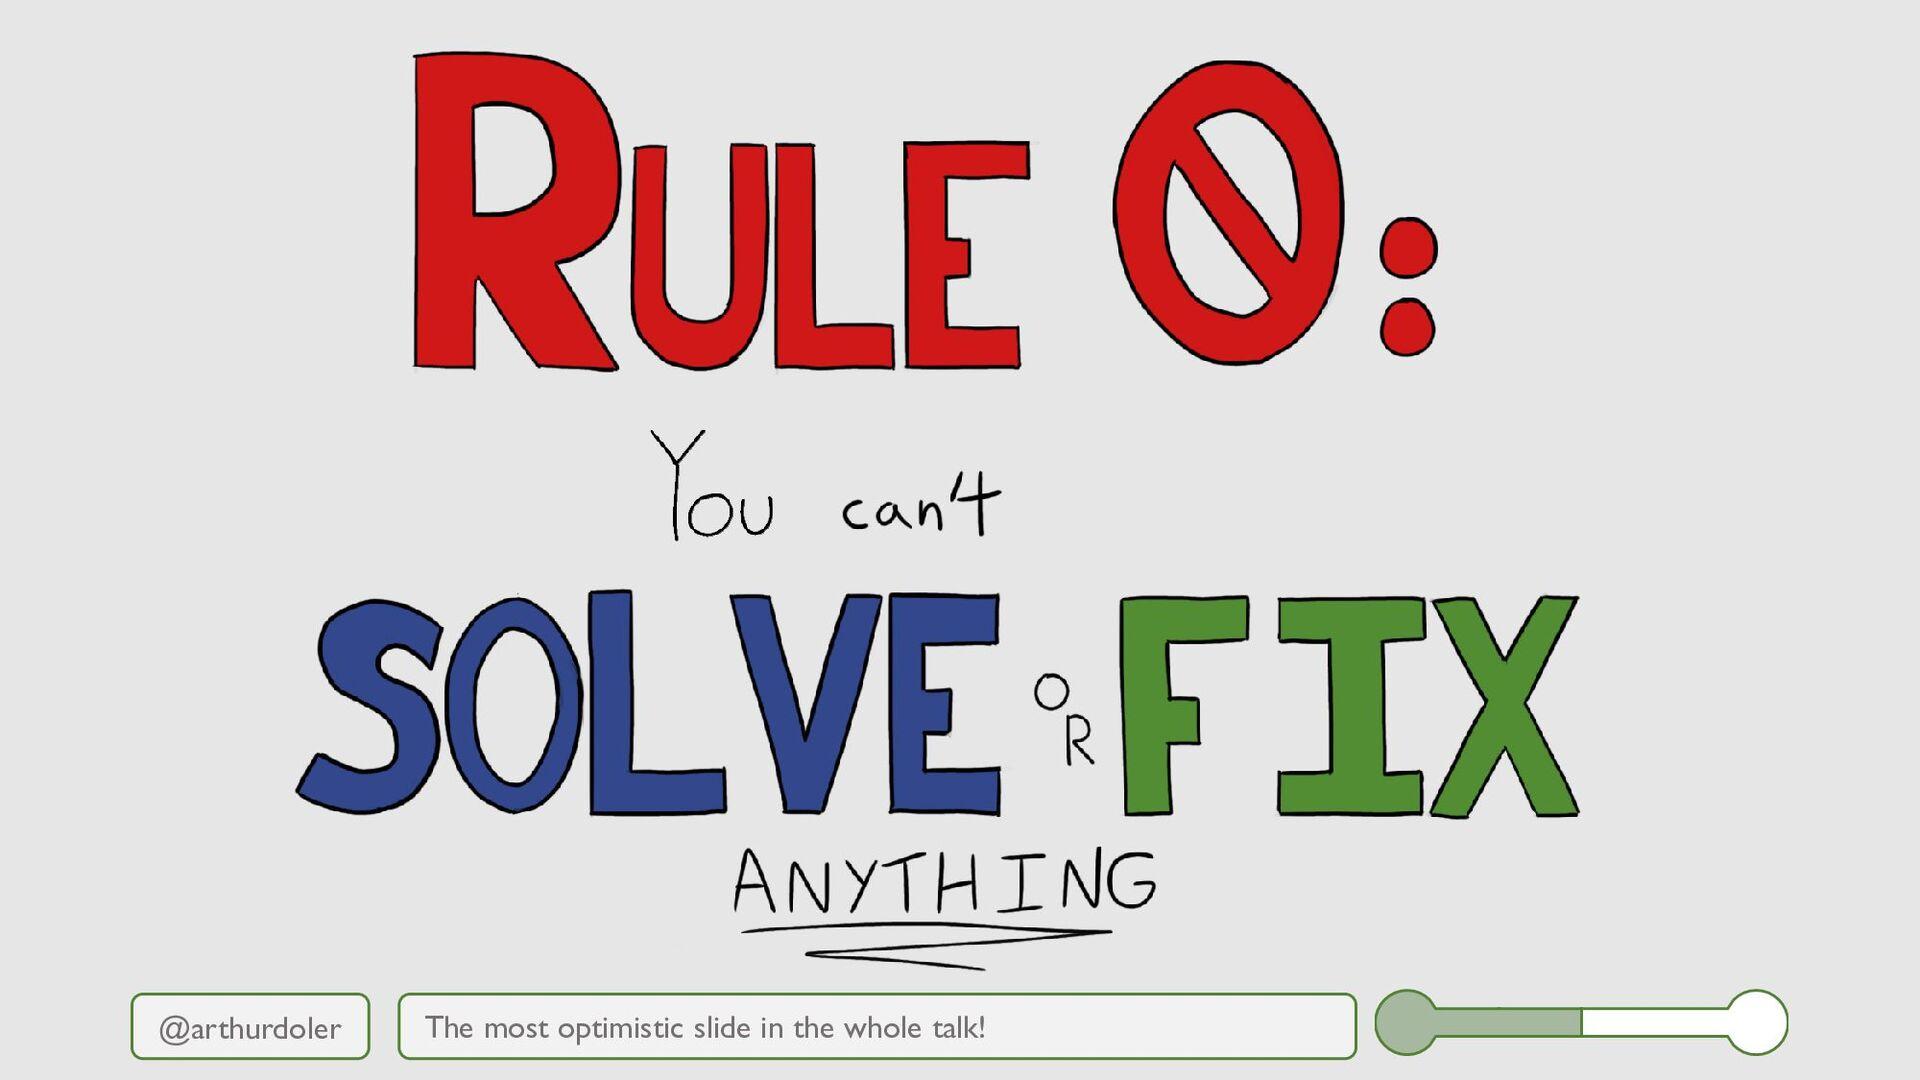 @arthurdoler The most optimistic slide in the w...